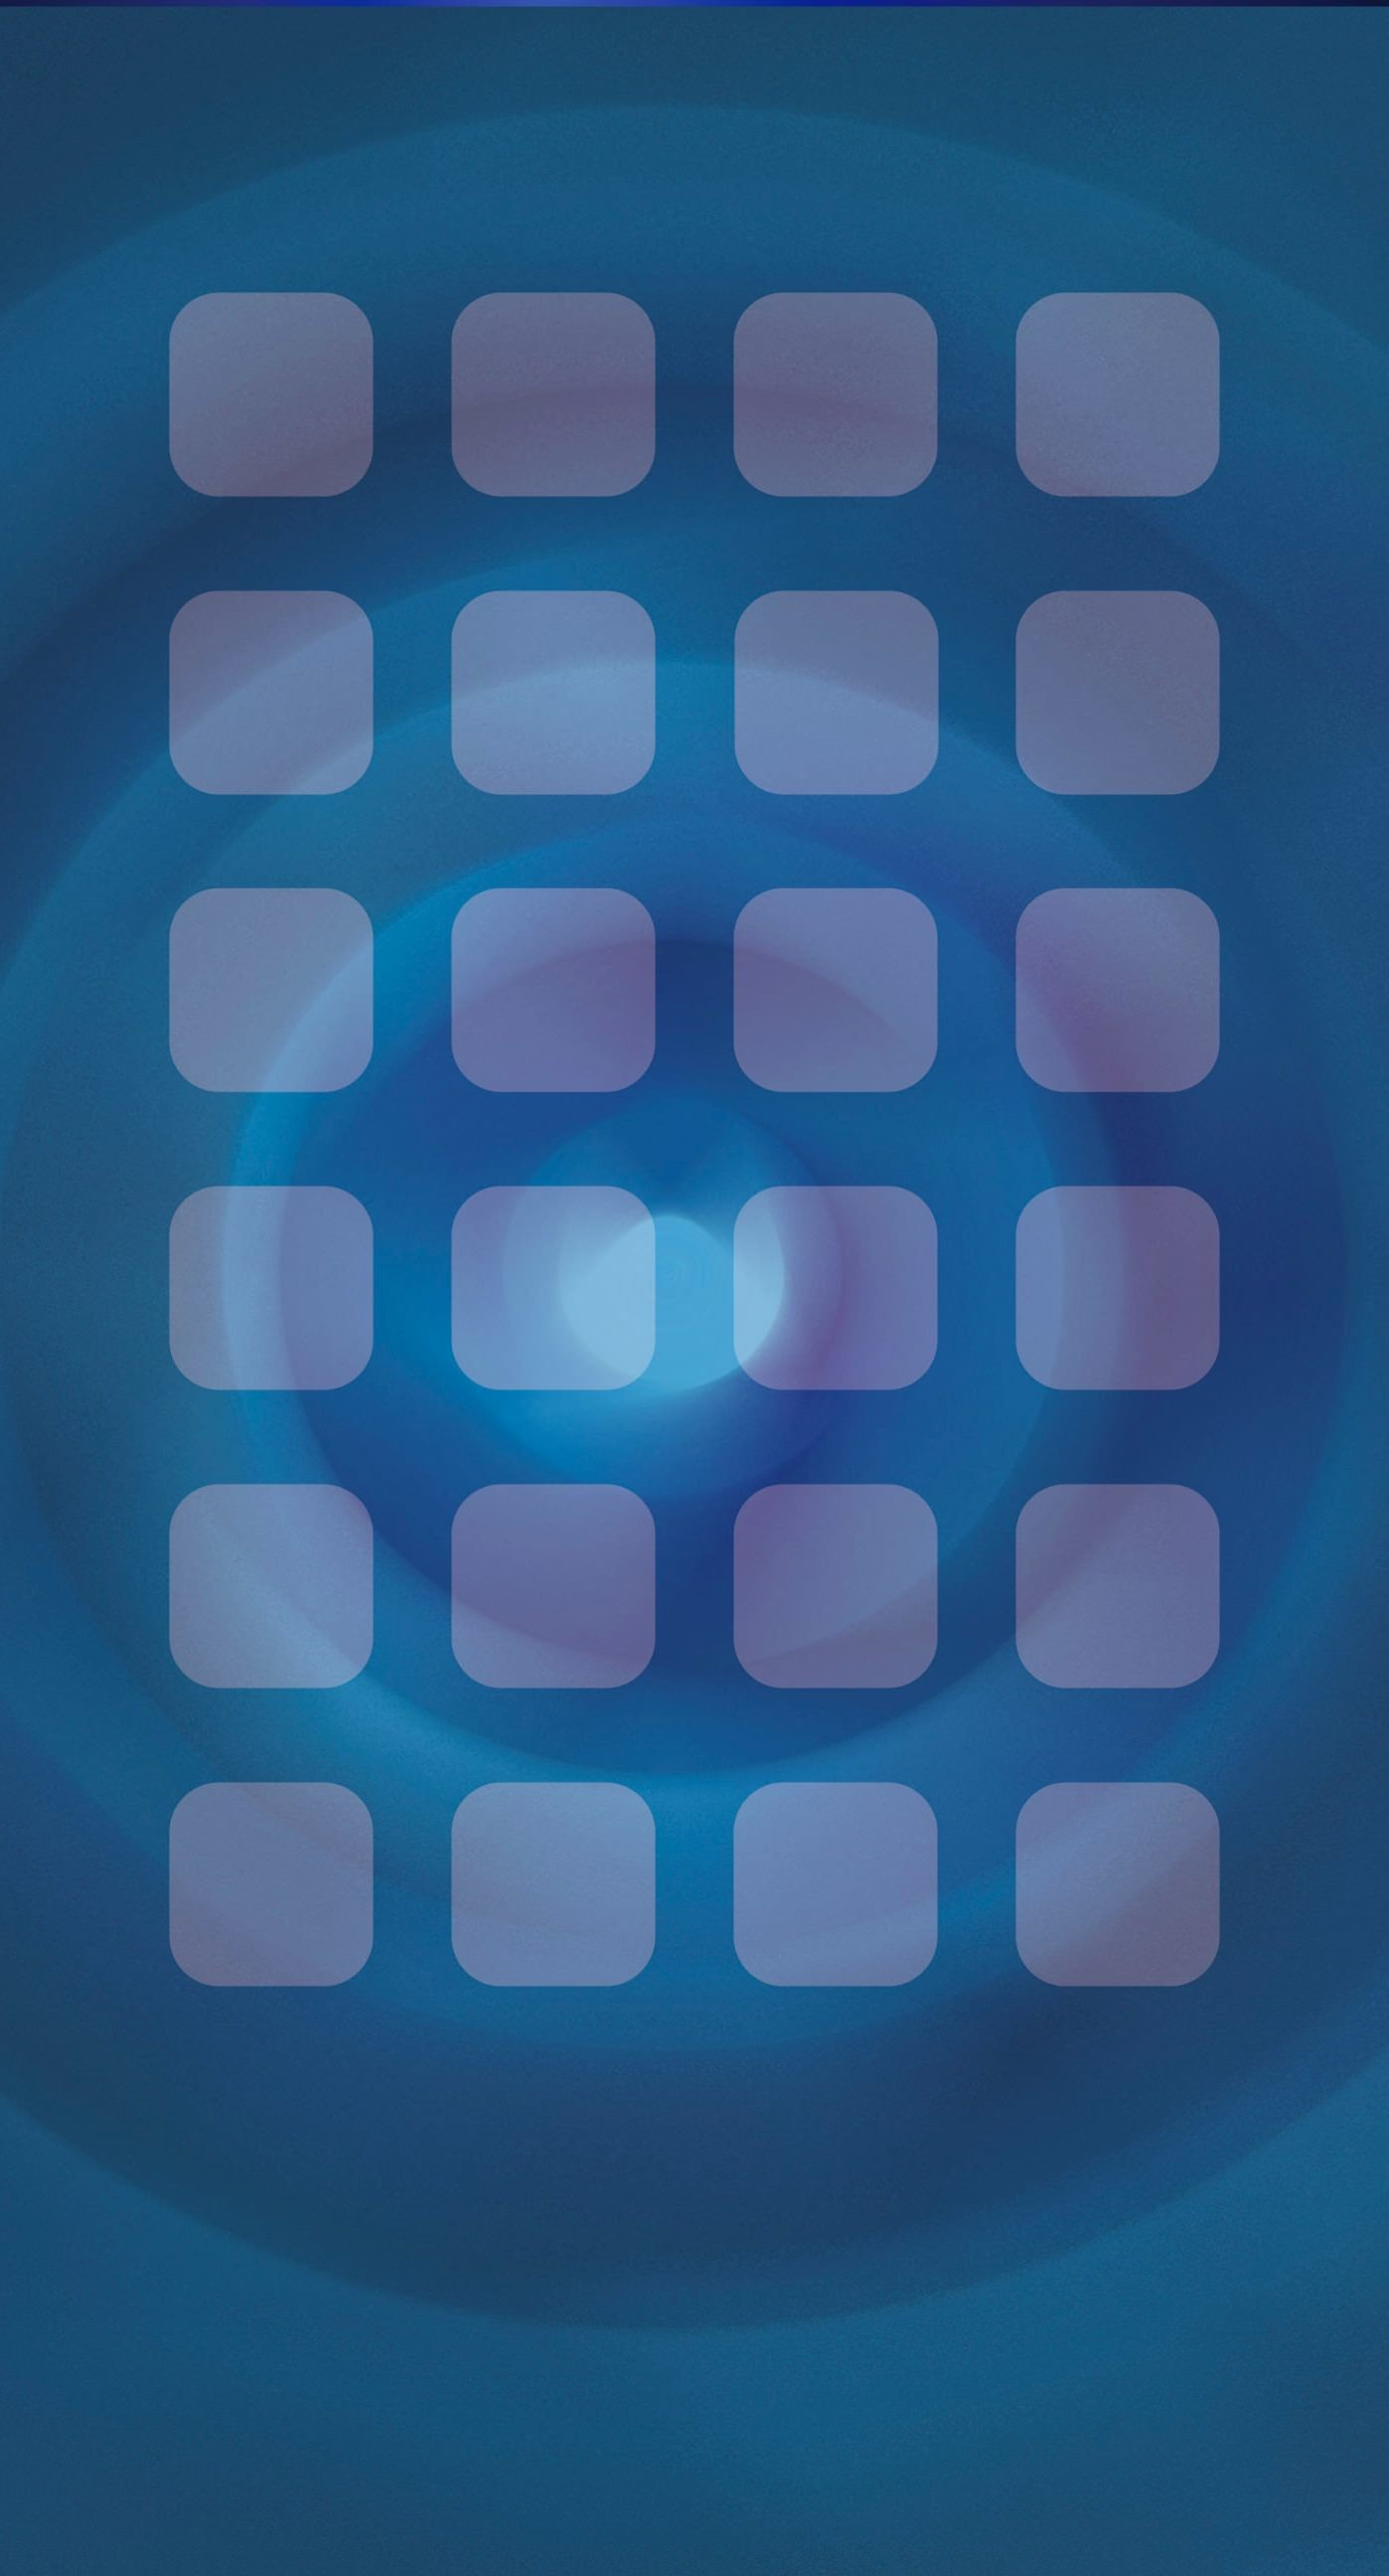 Abluecoolpatternshelfswirl. iPhone 7 Plus Wallpaper